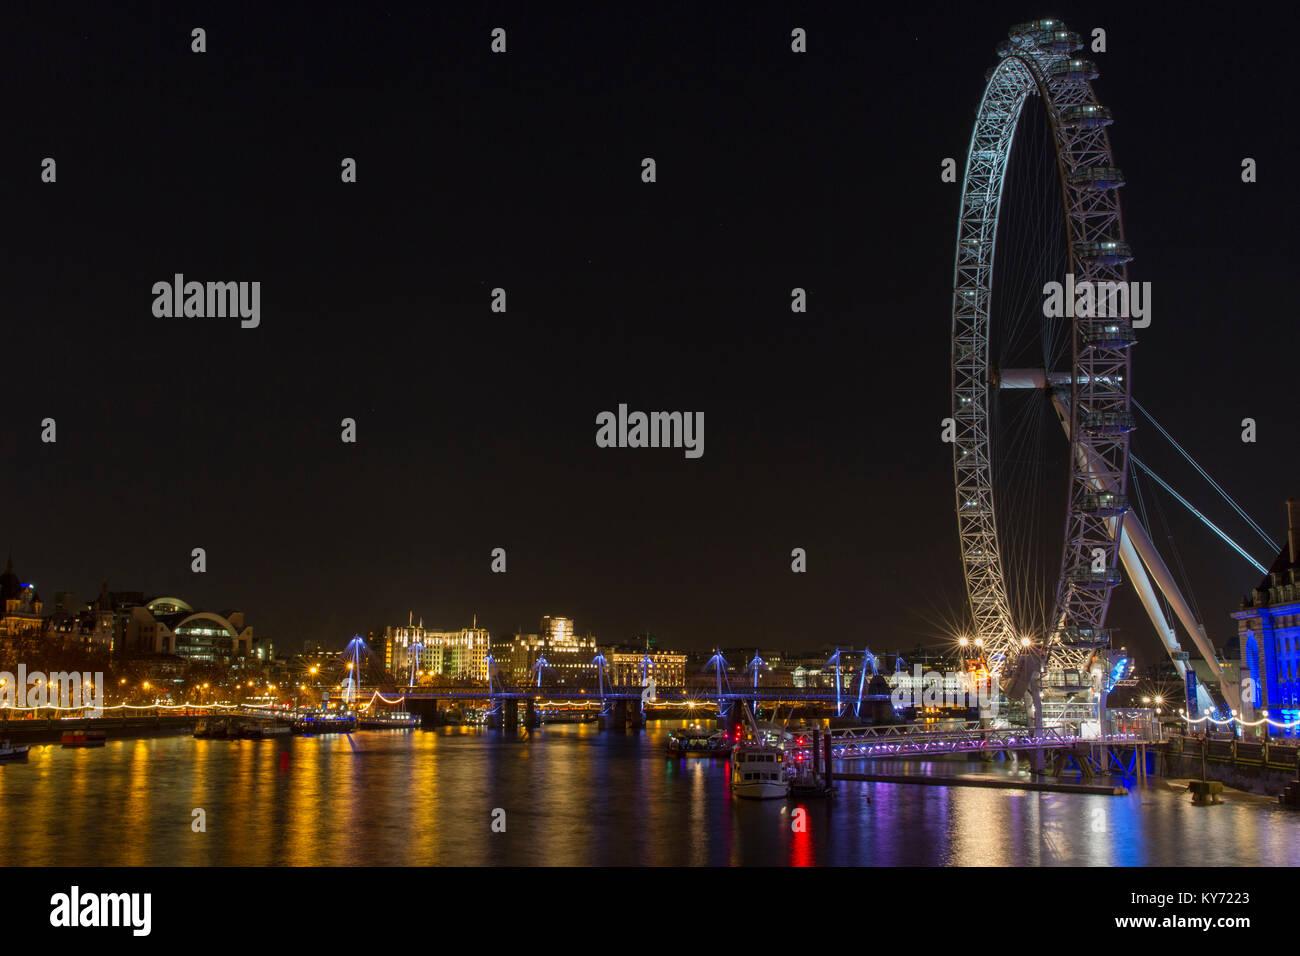 Unlit London Eye at night. - Stock Image